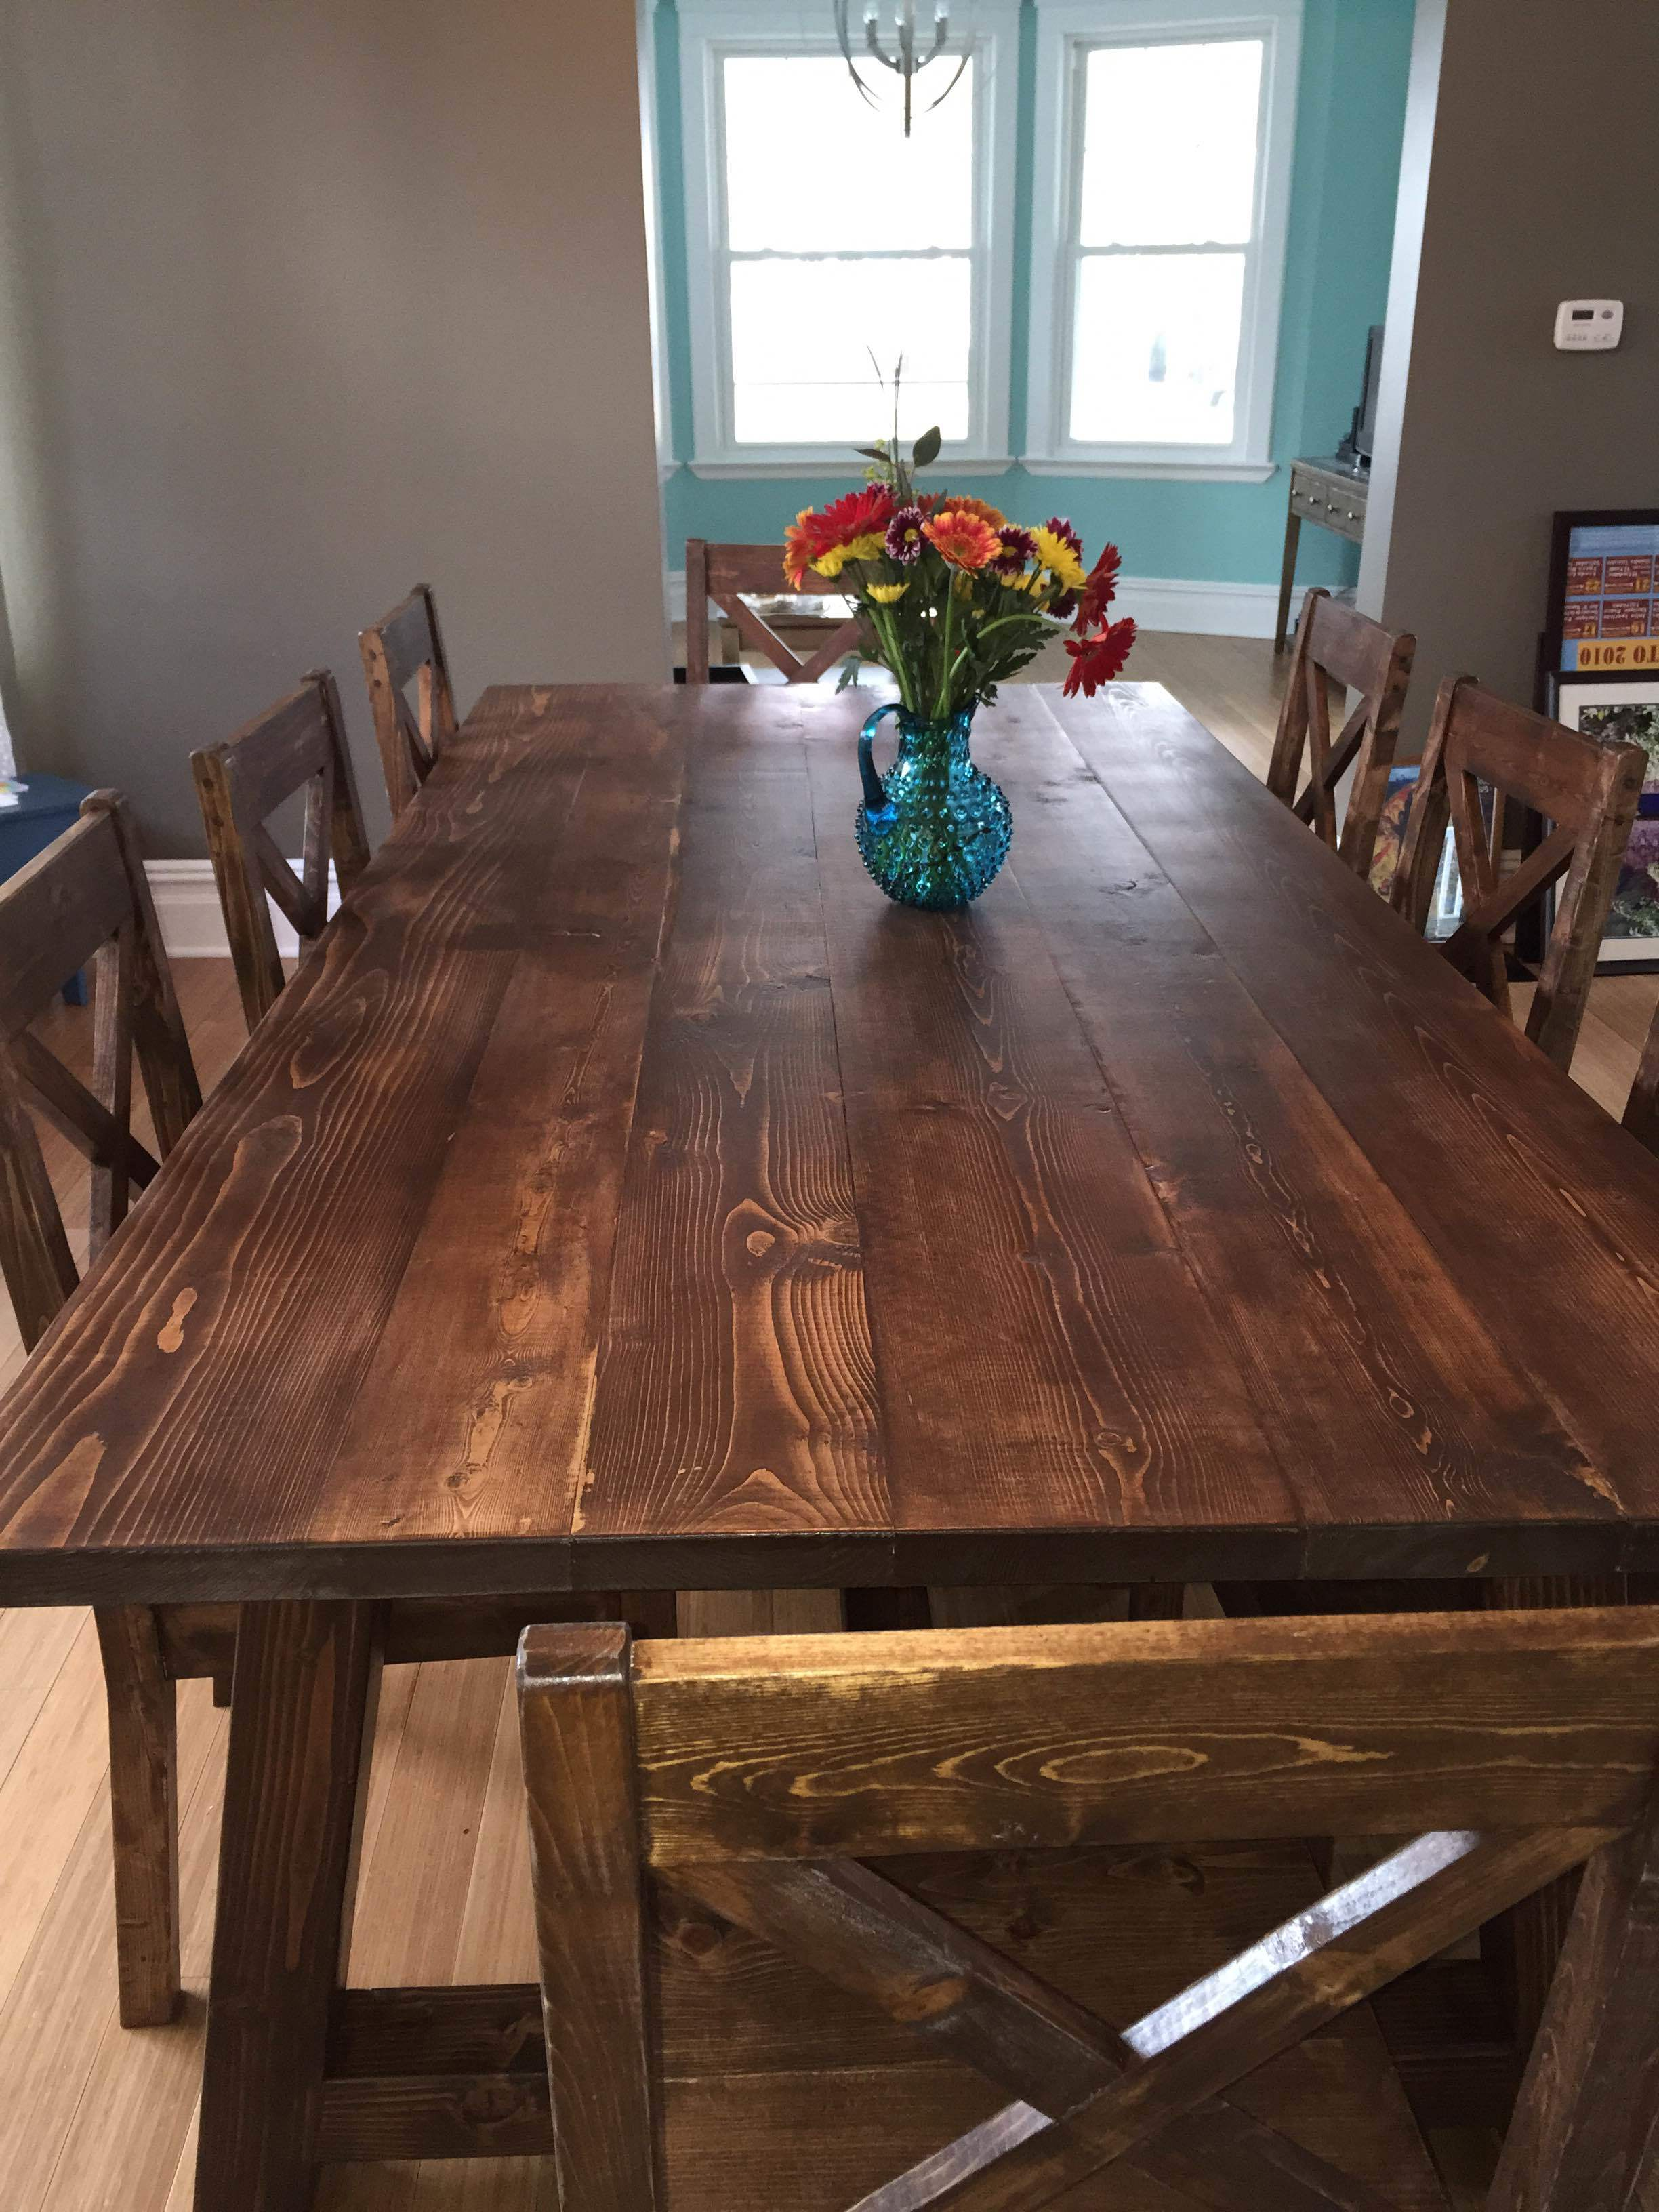 Truss Beam Table and Chairs. Fein 1.JPG